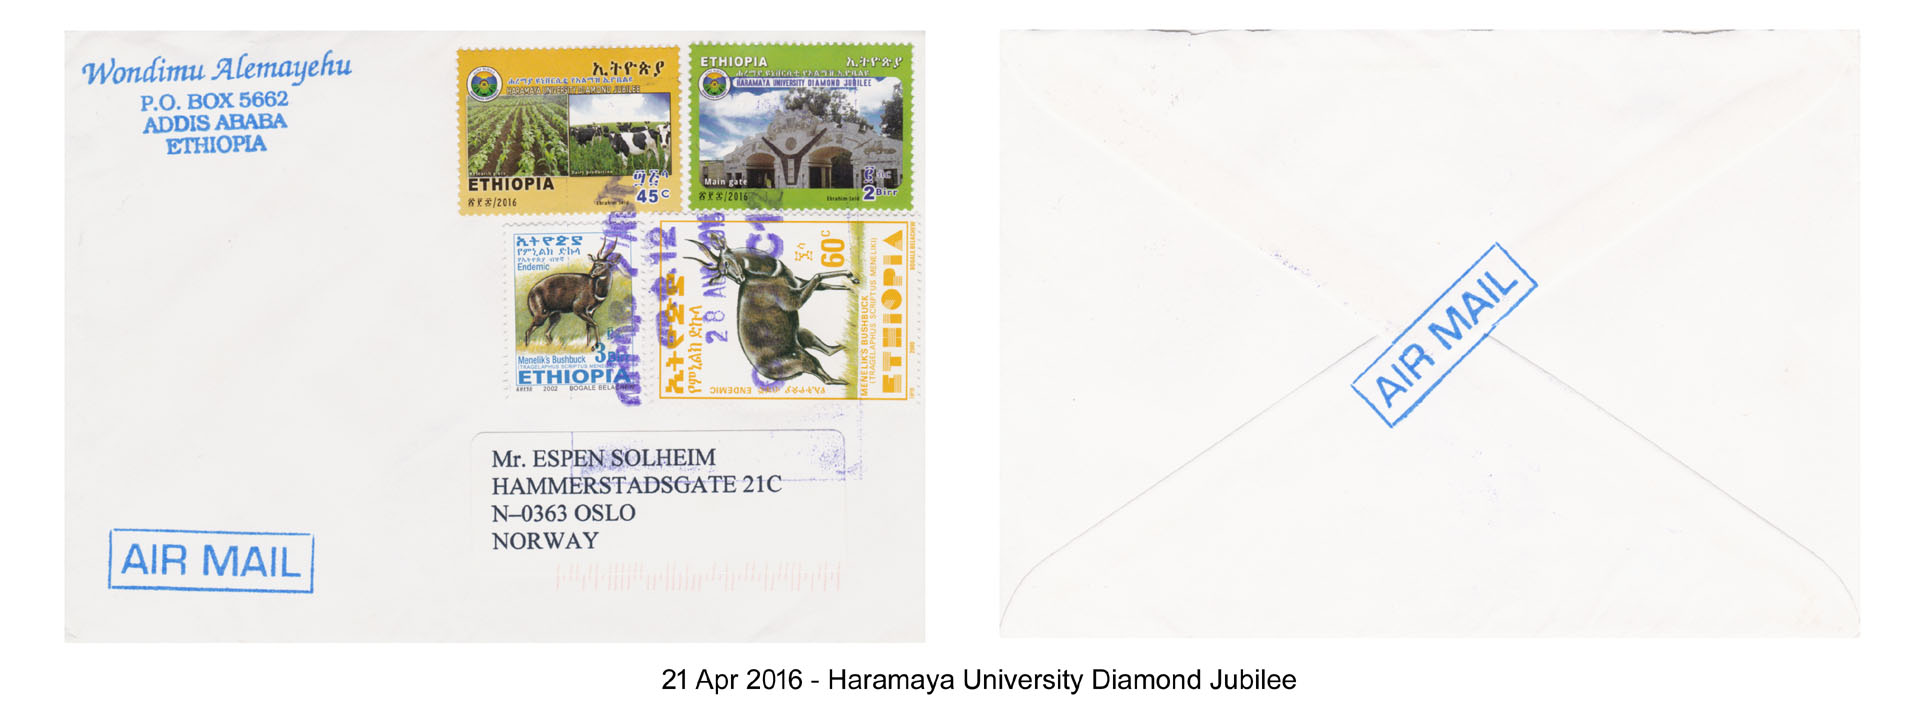 20160421 – Haramaya University Diamond Jubilee